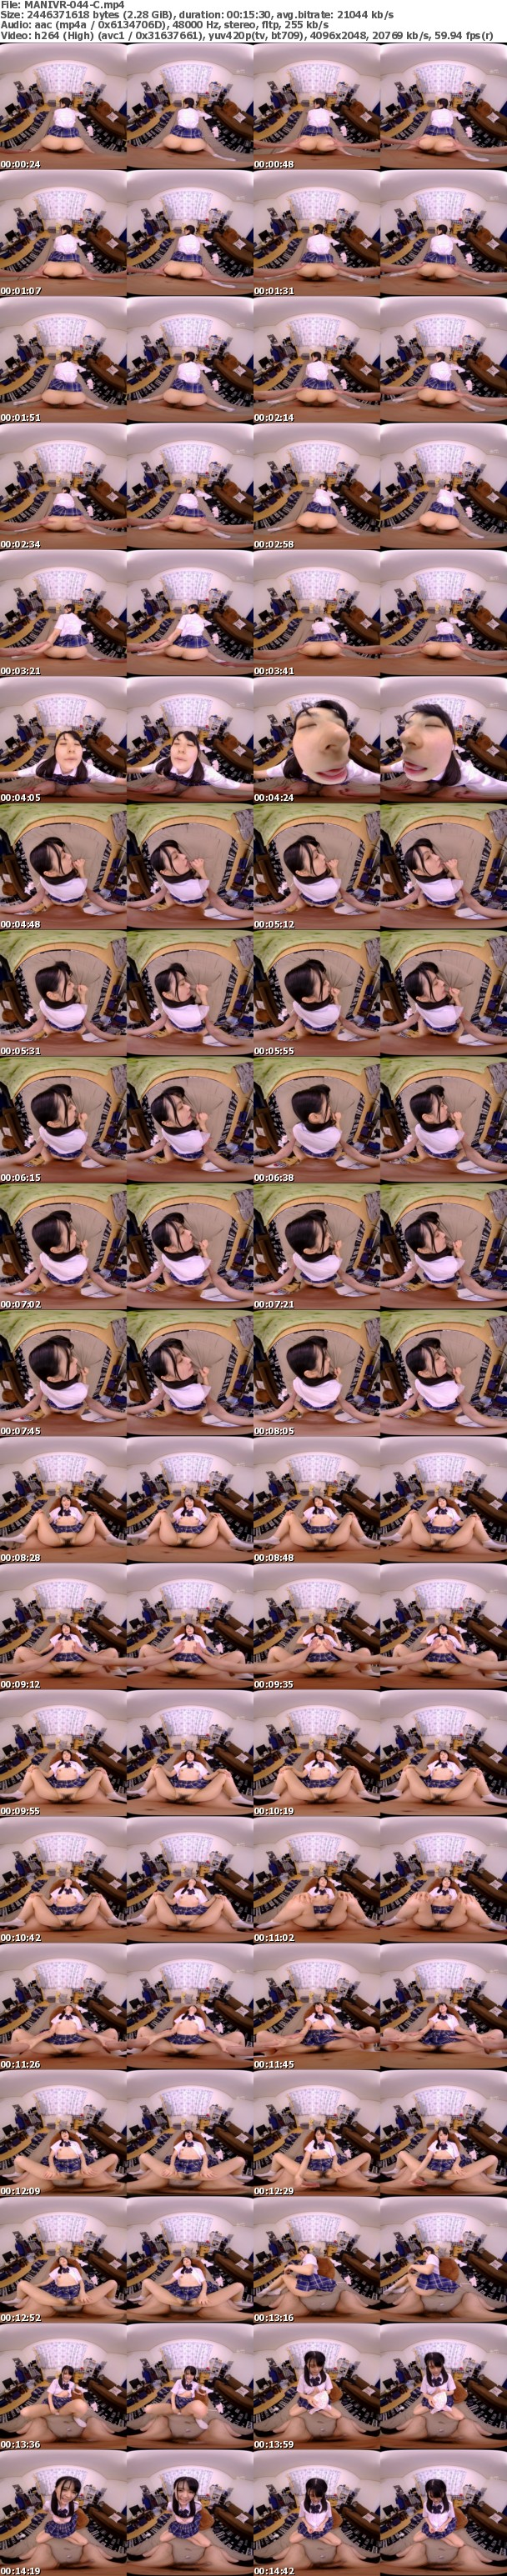 (VR) MANIVR-044 向かいの席から見せつけてくる女子○生の電車パンチラで挑発されて…